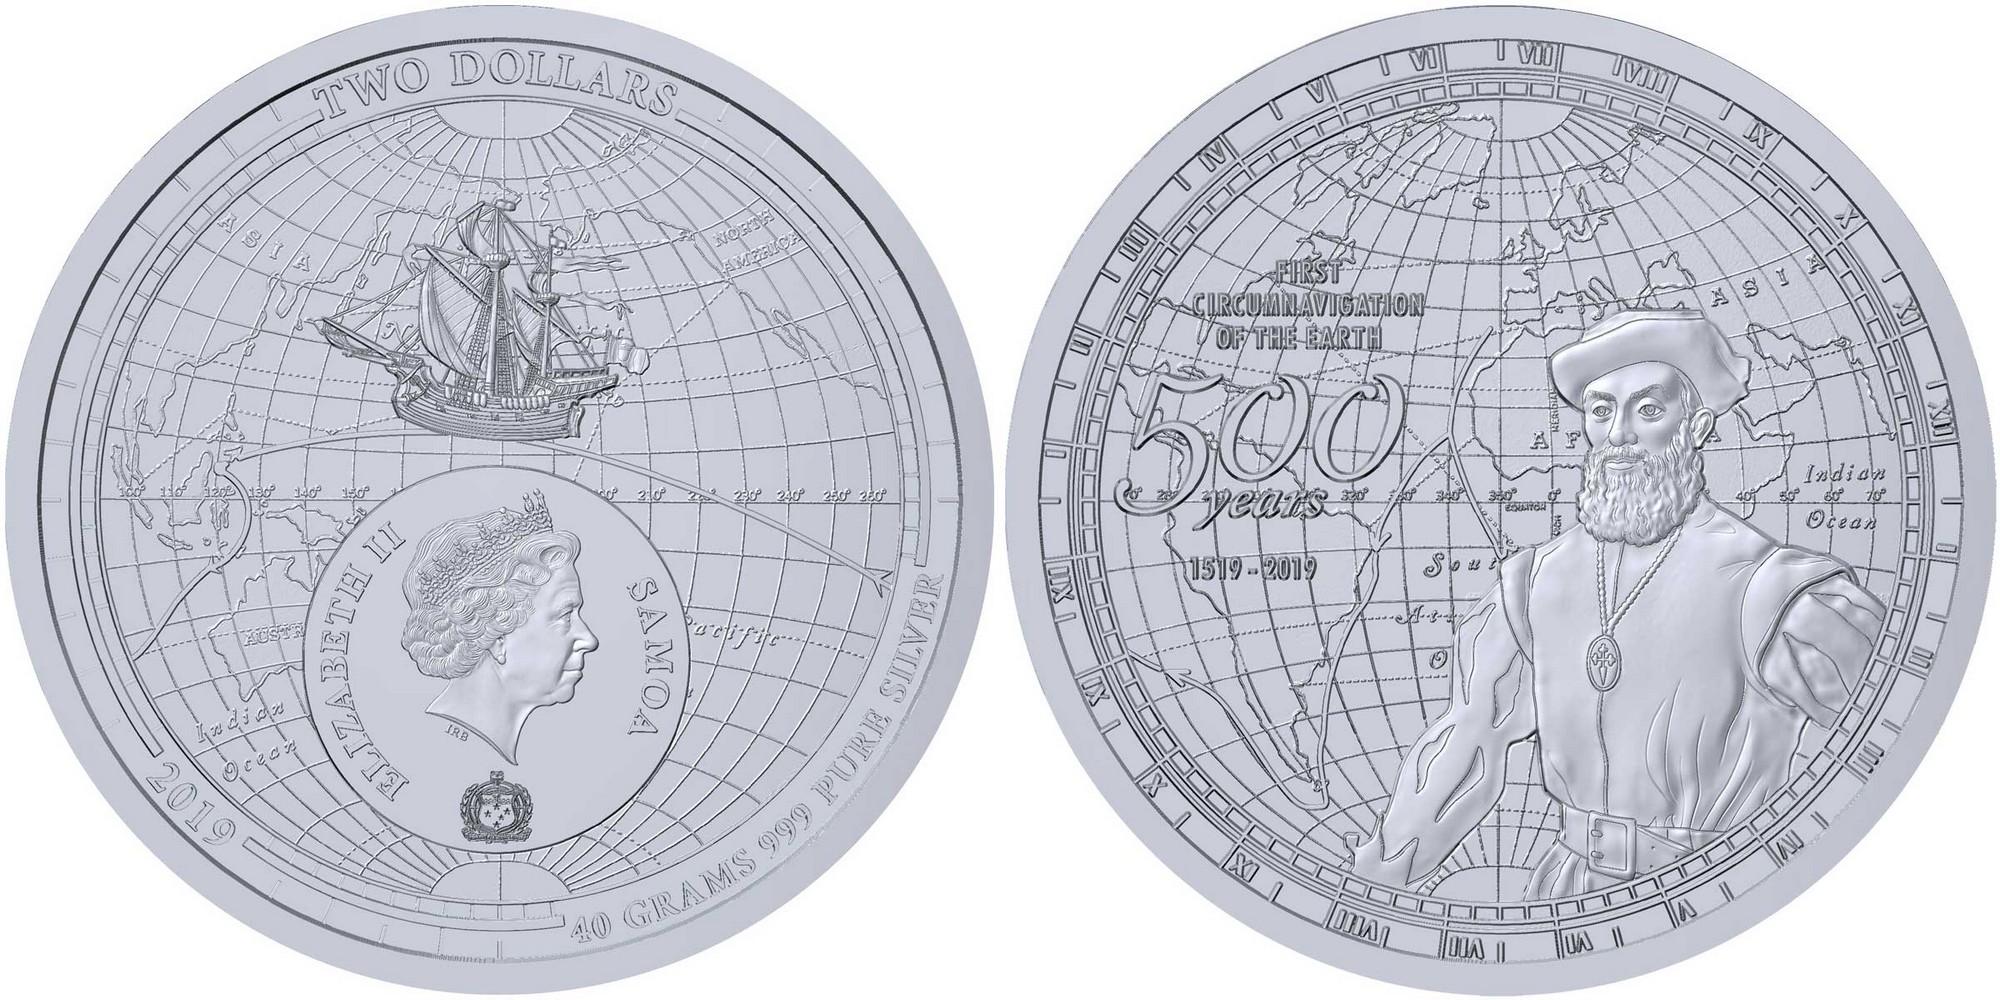 samoa-2019-navigation-autour-du-globe-magellan